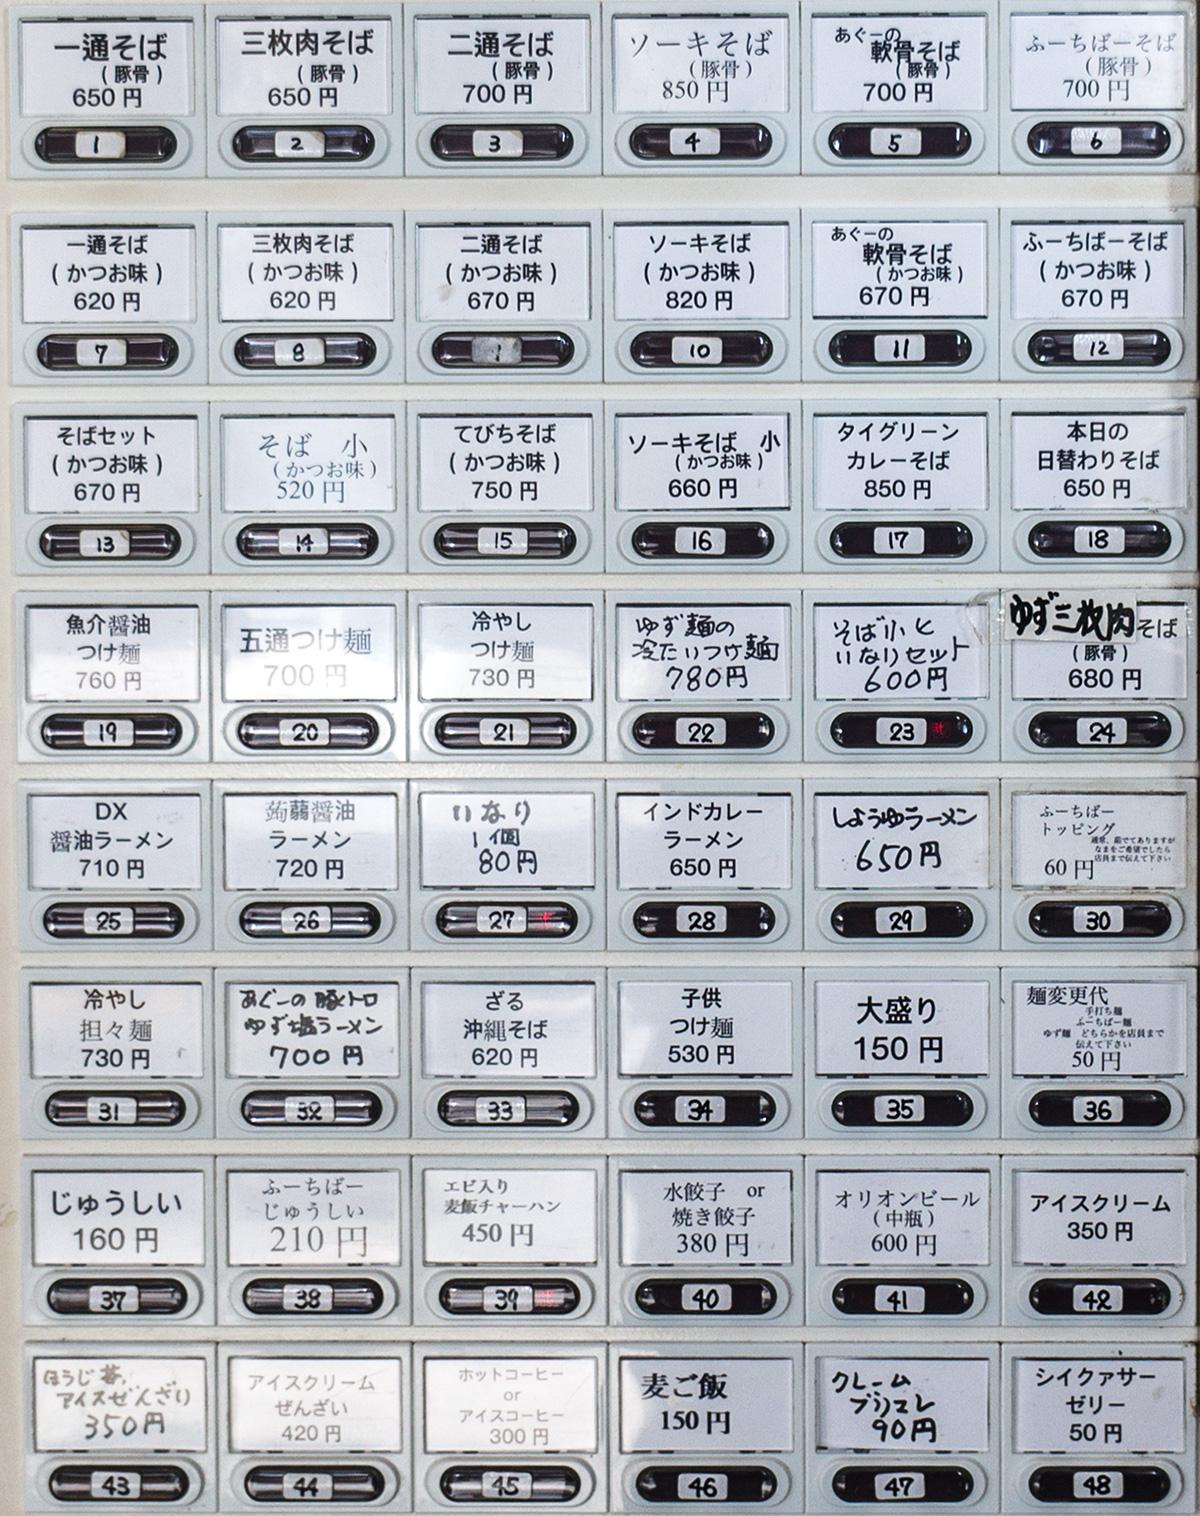 menu_ippotsuko.jpg